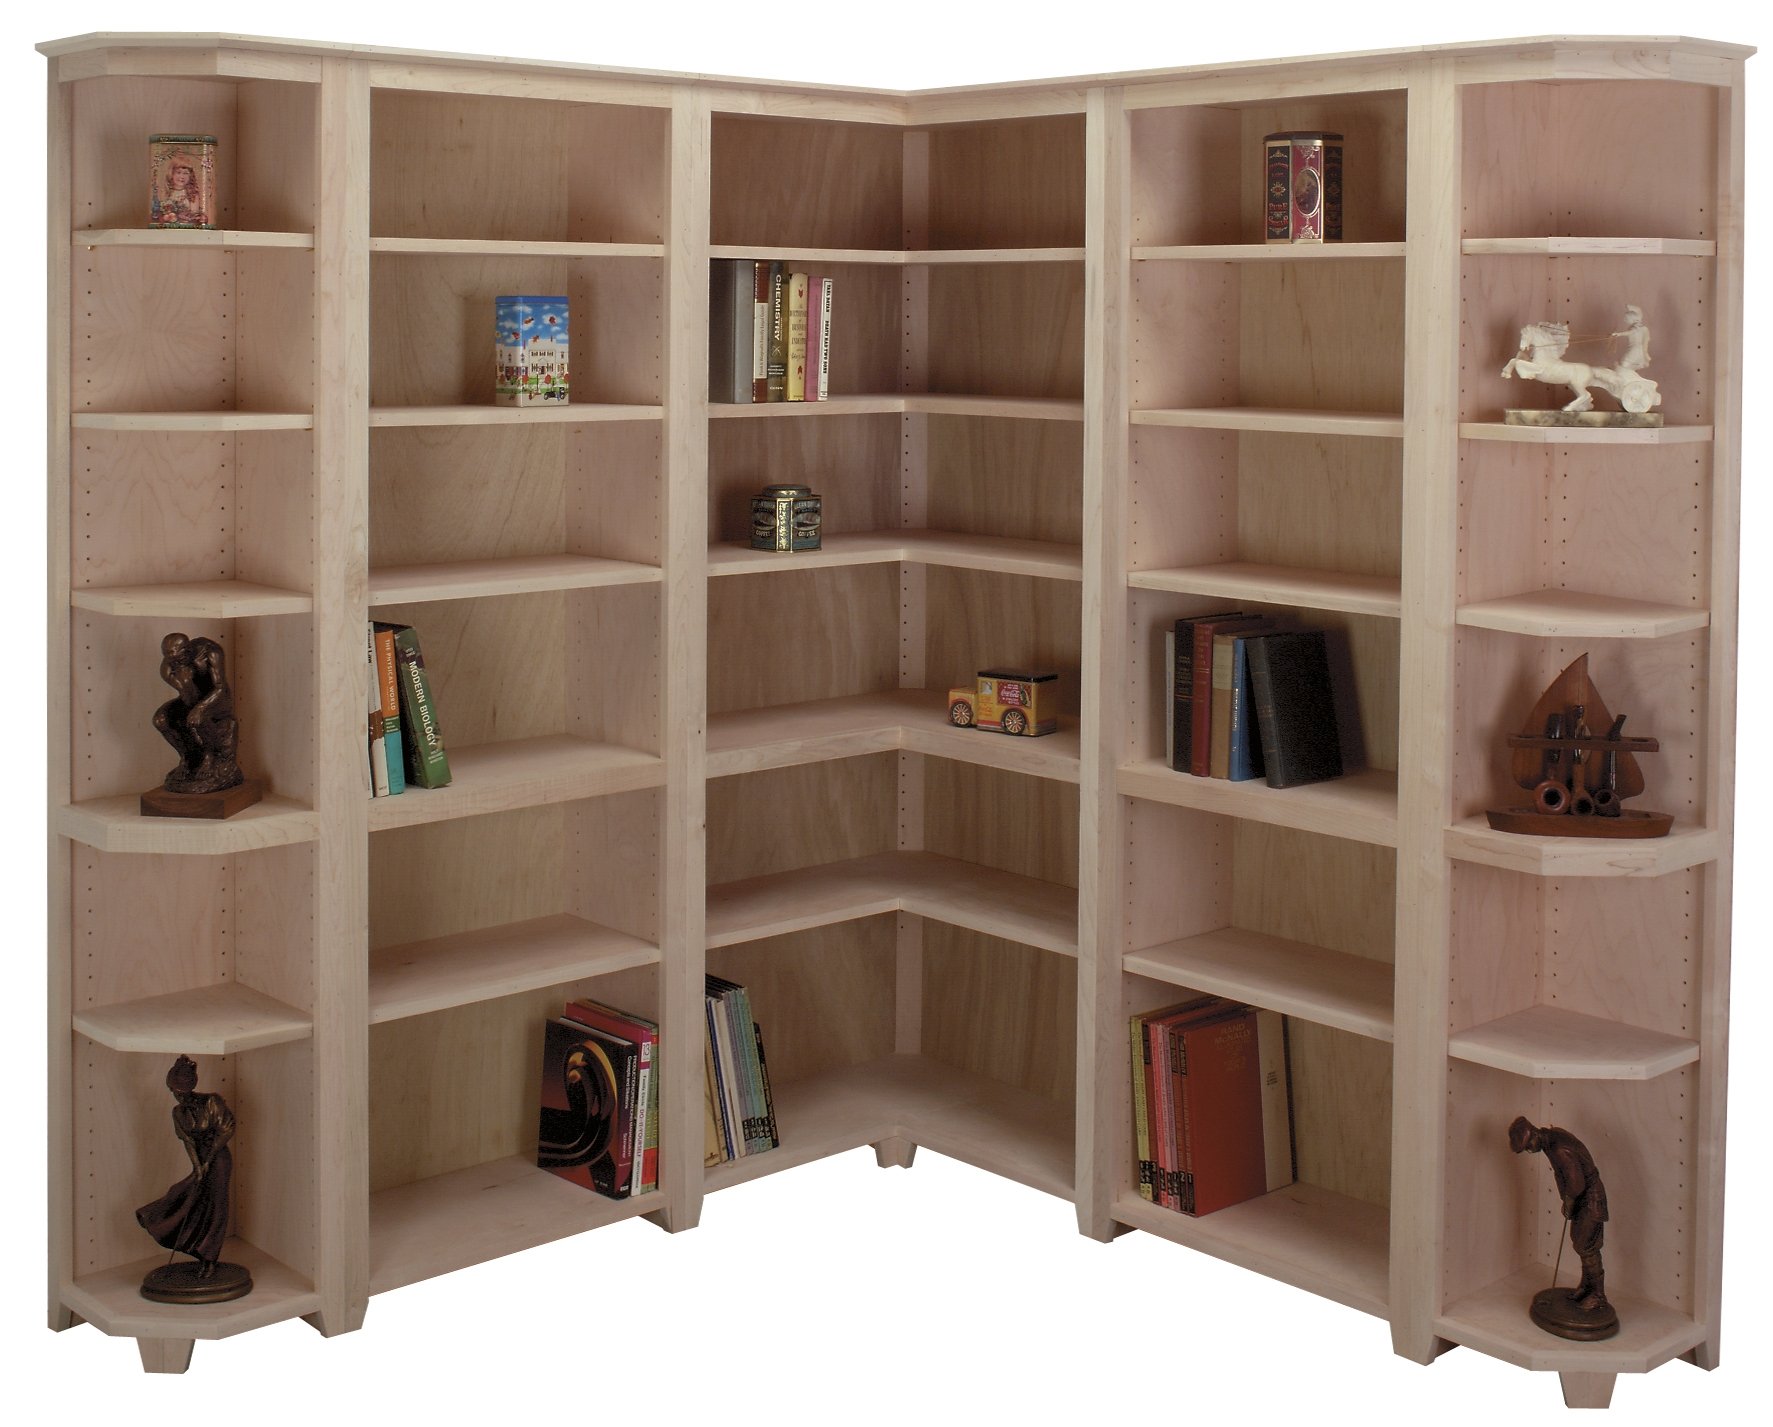 Corner Bookcase Plans Corner Book Plans Amazing Book S Corner For Large Bookcase Plans (View 9 of 15)